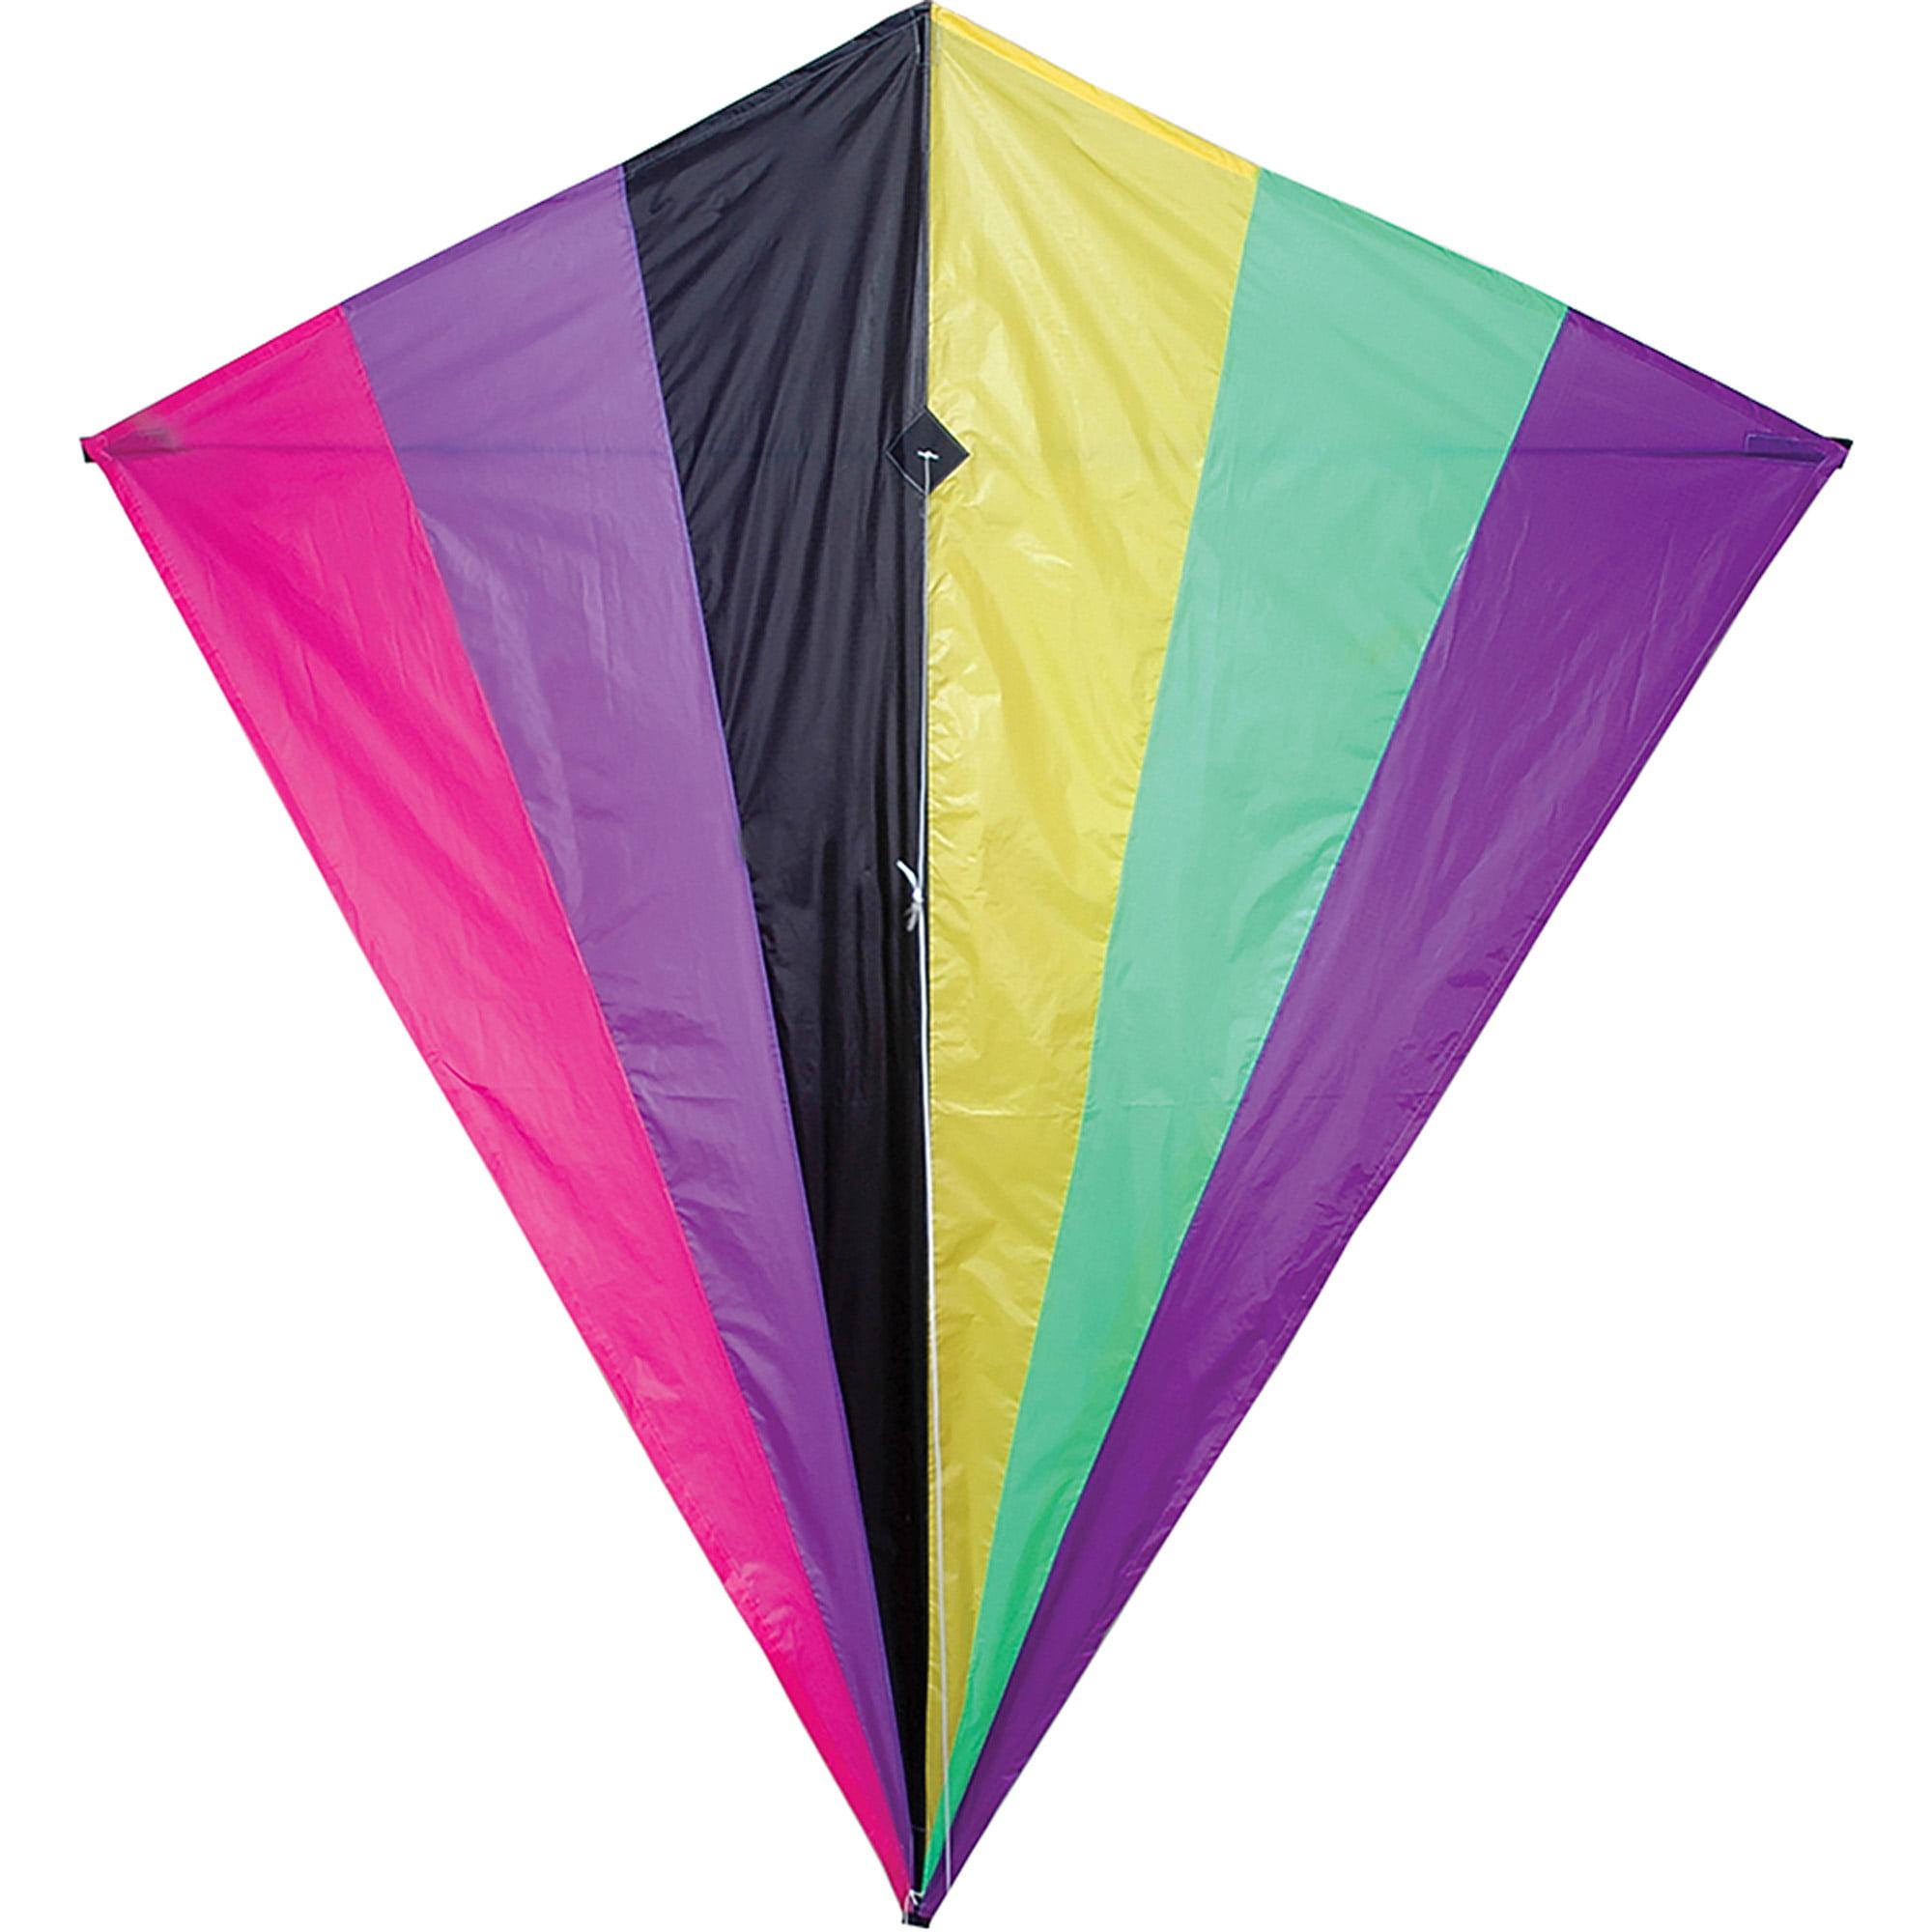 "Premier Designs 65"" Diamond Kite, Neon by Premier Kite"